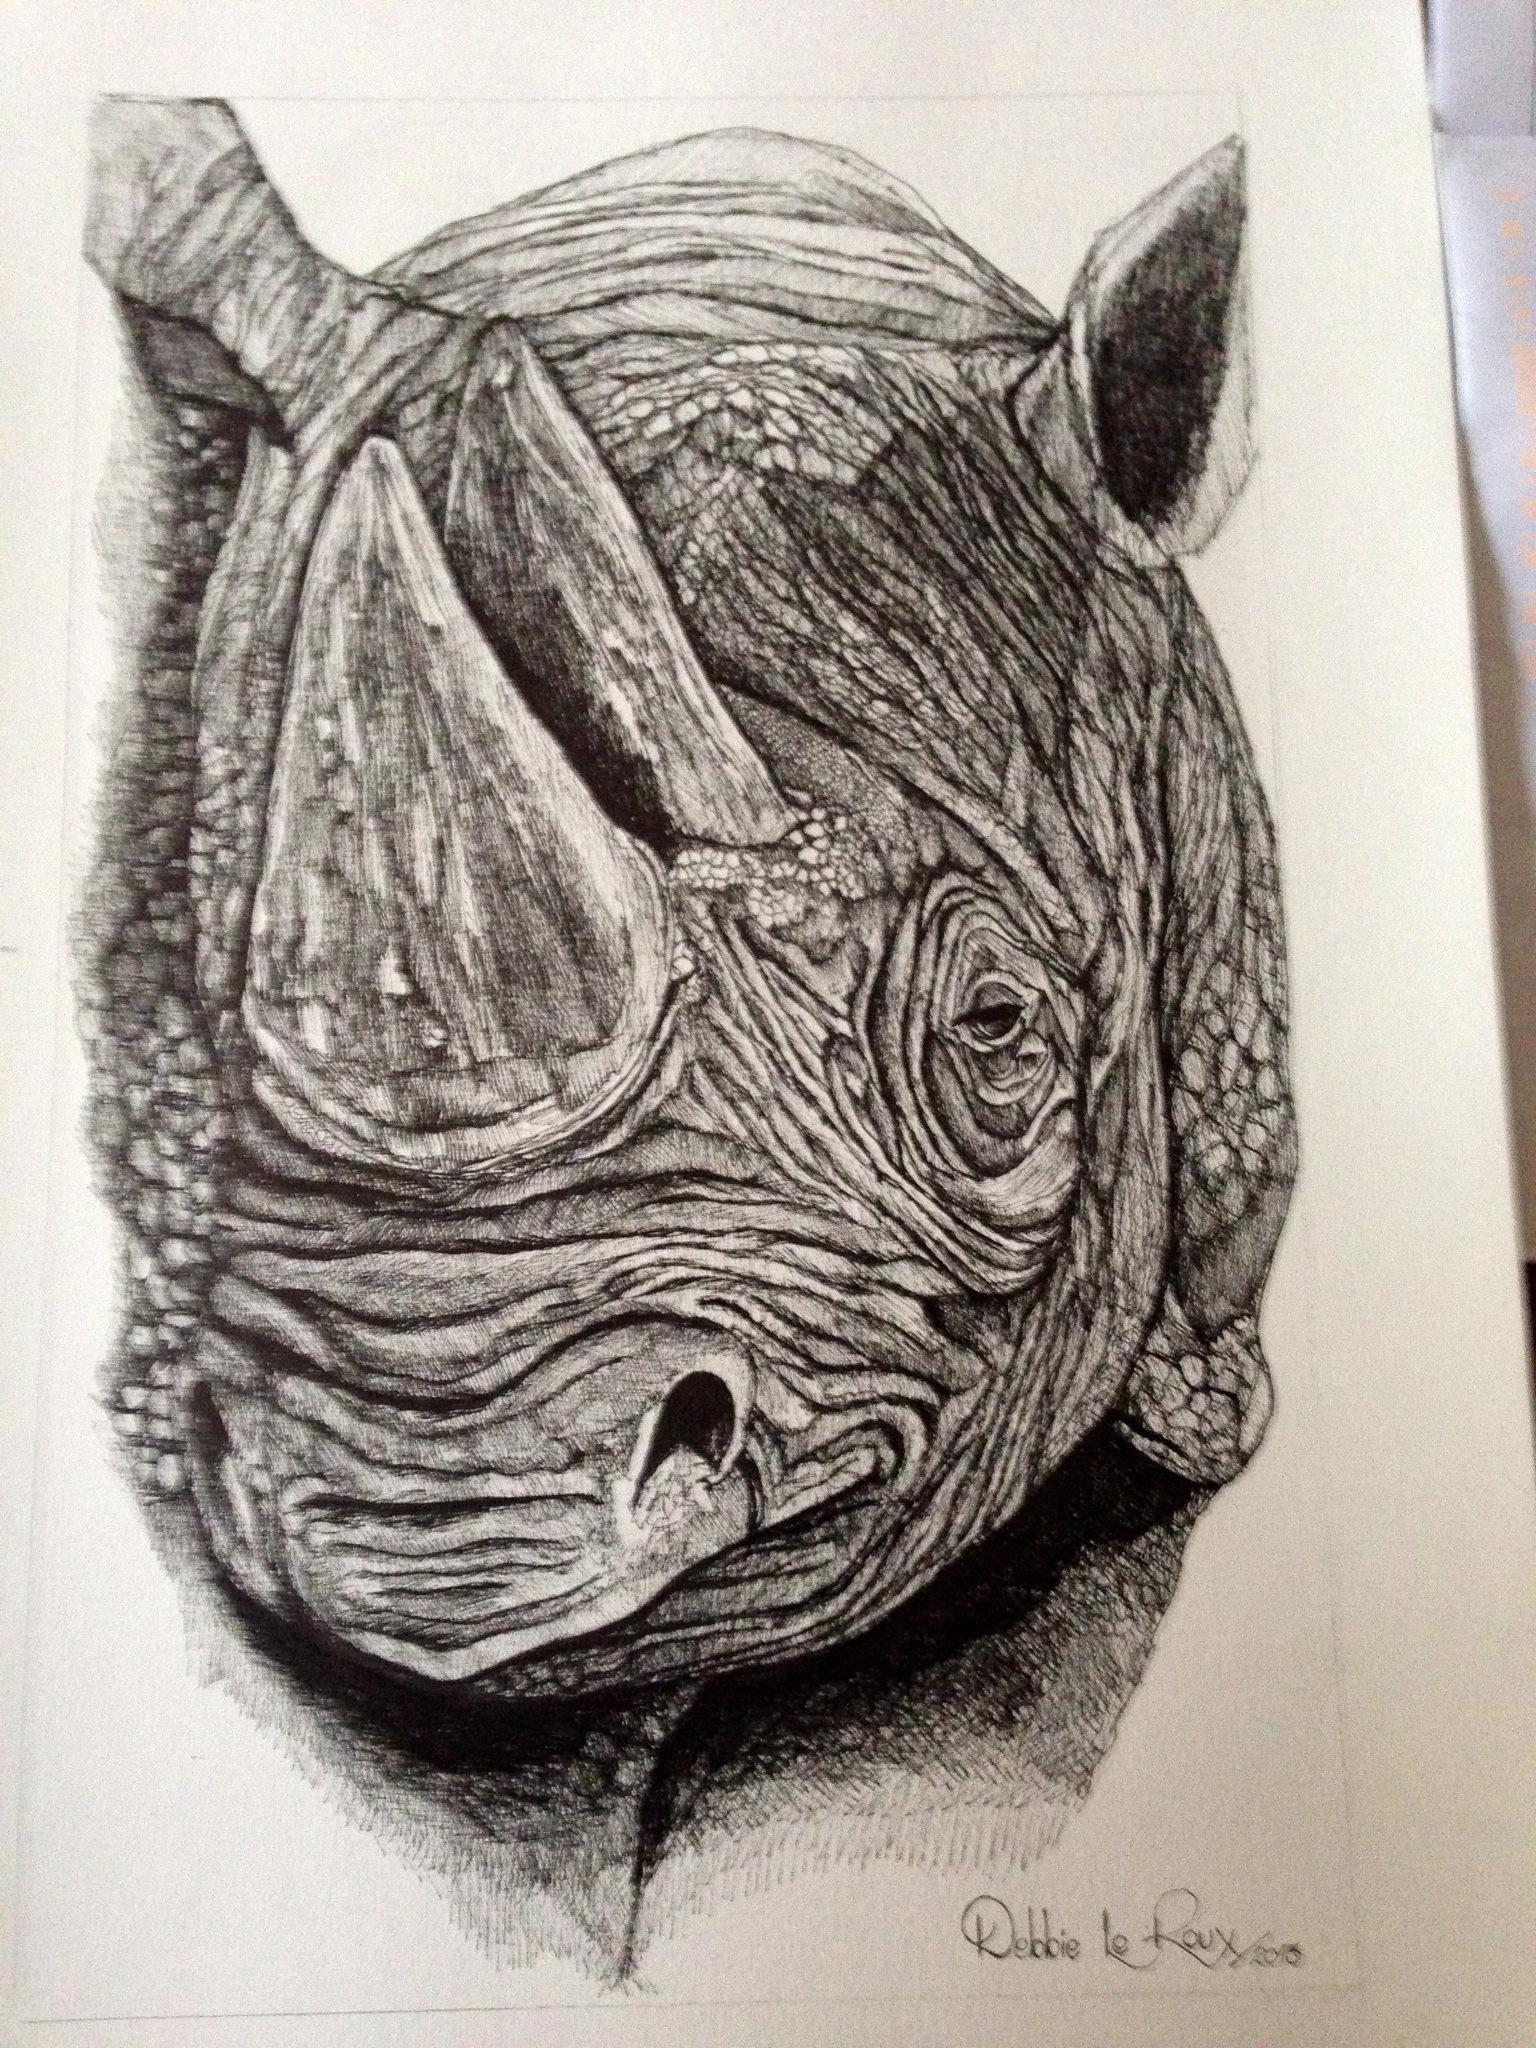 Drawn rhino african rhino Rhino Debbie le drawing for